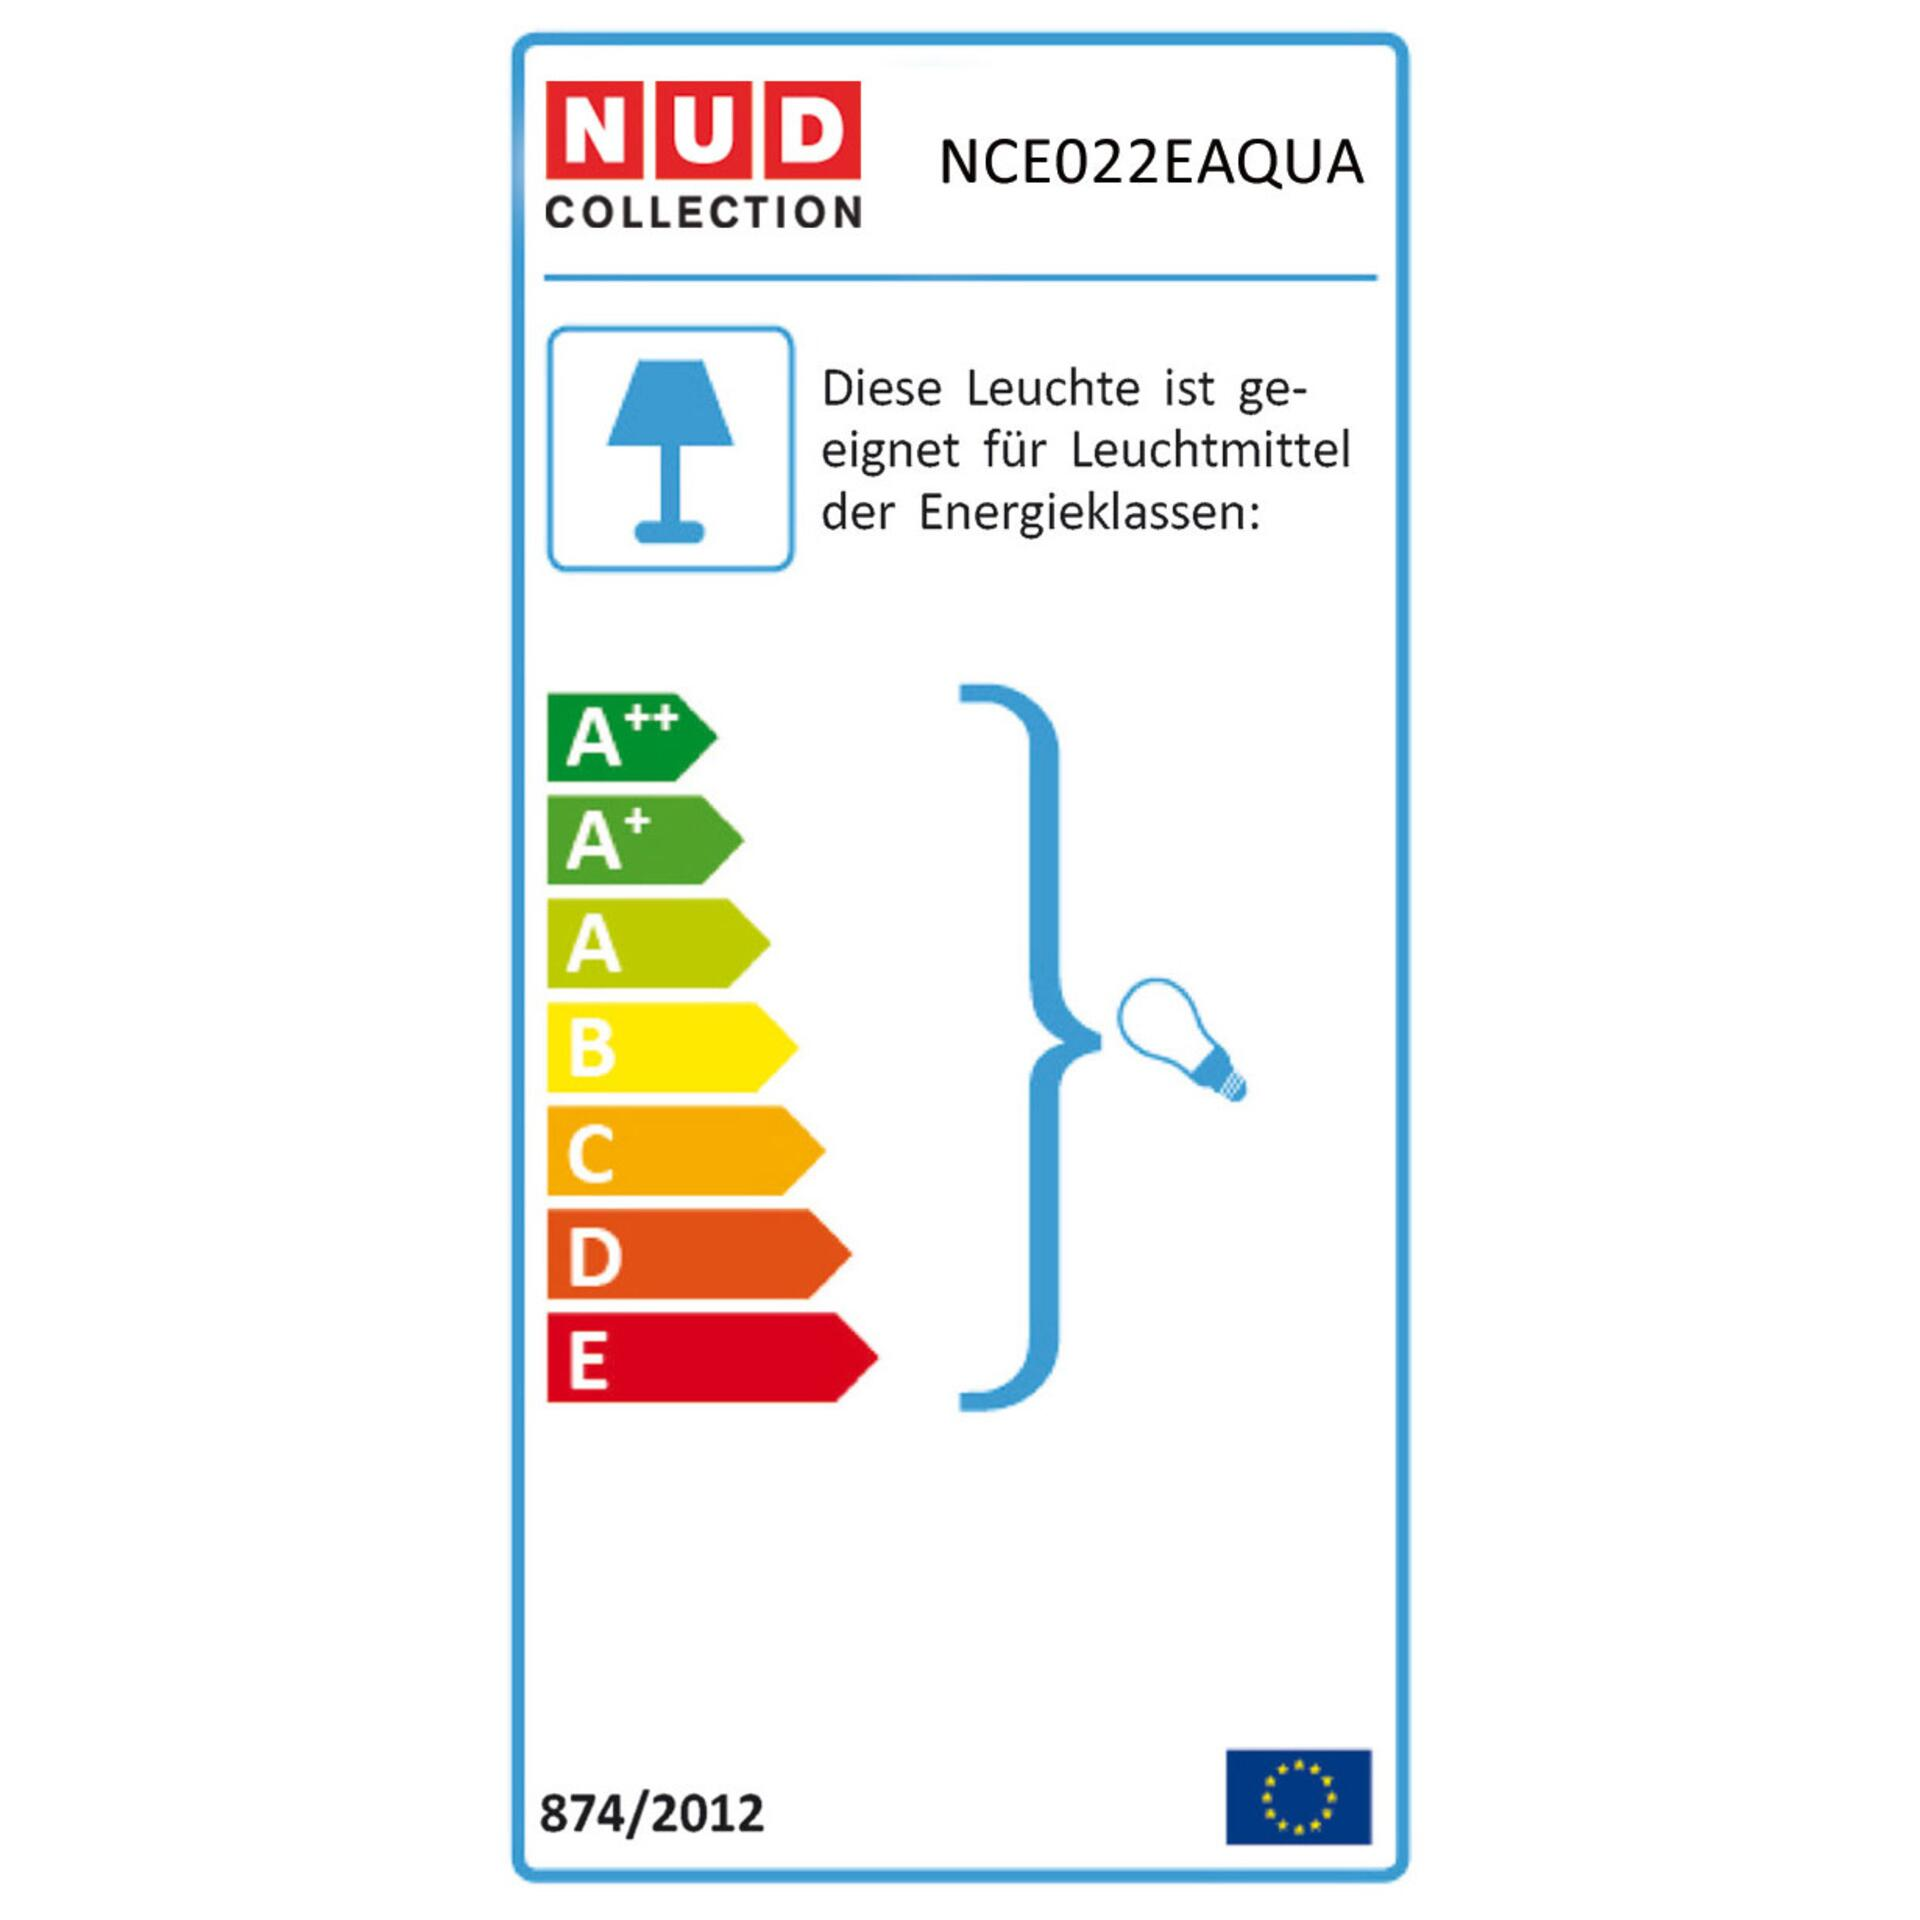 Nud Kupferleuchte Aqua Schwarz